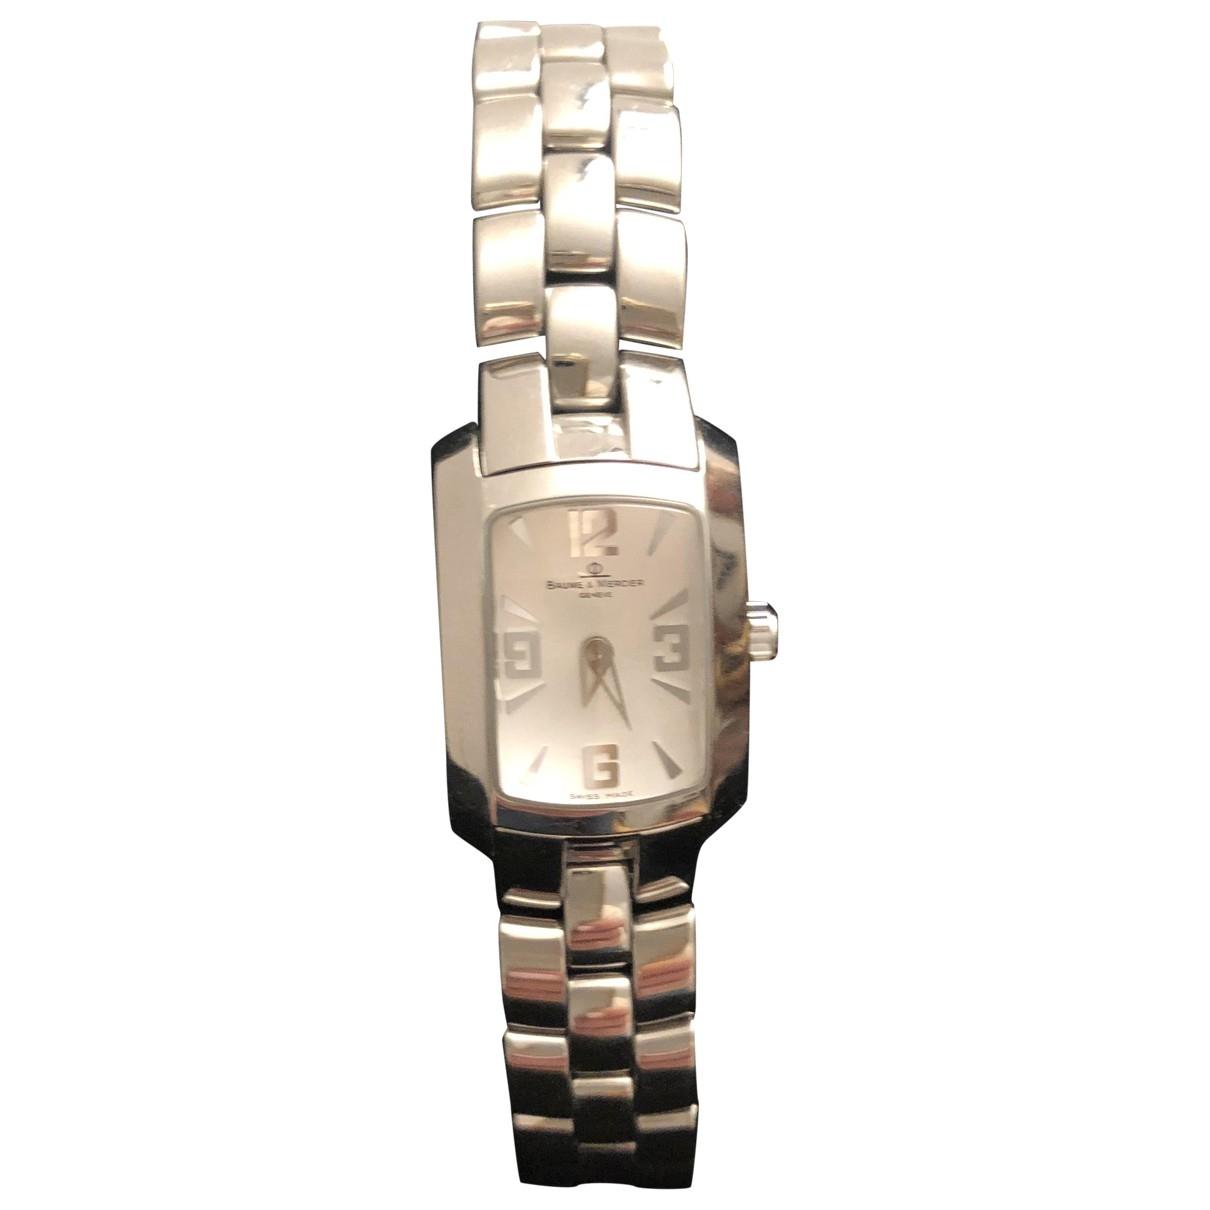 Baume Et Mercier Hampton Lady Uhr in  Silber Stahl